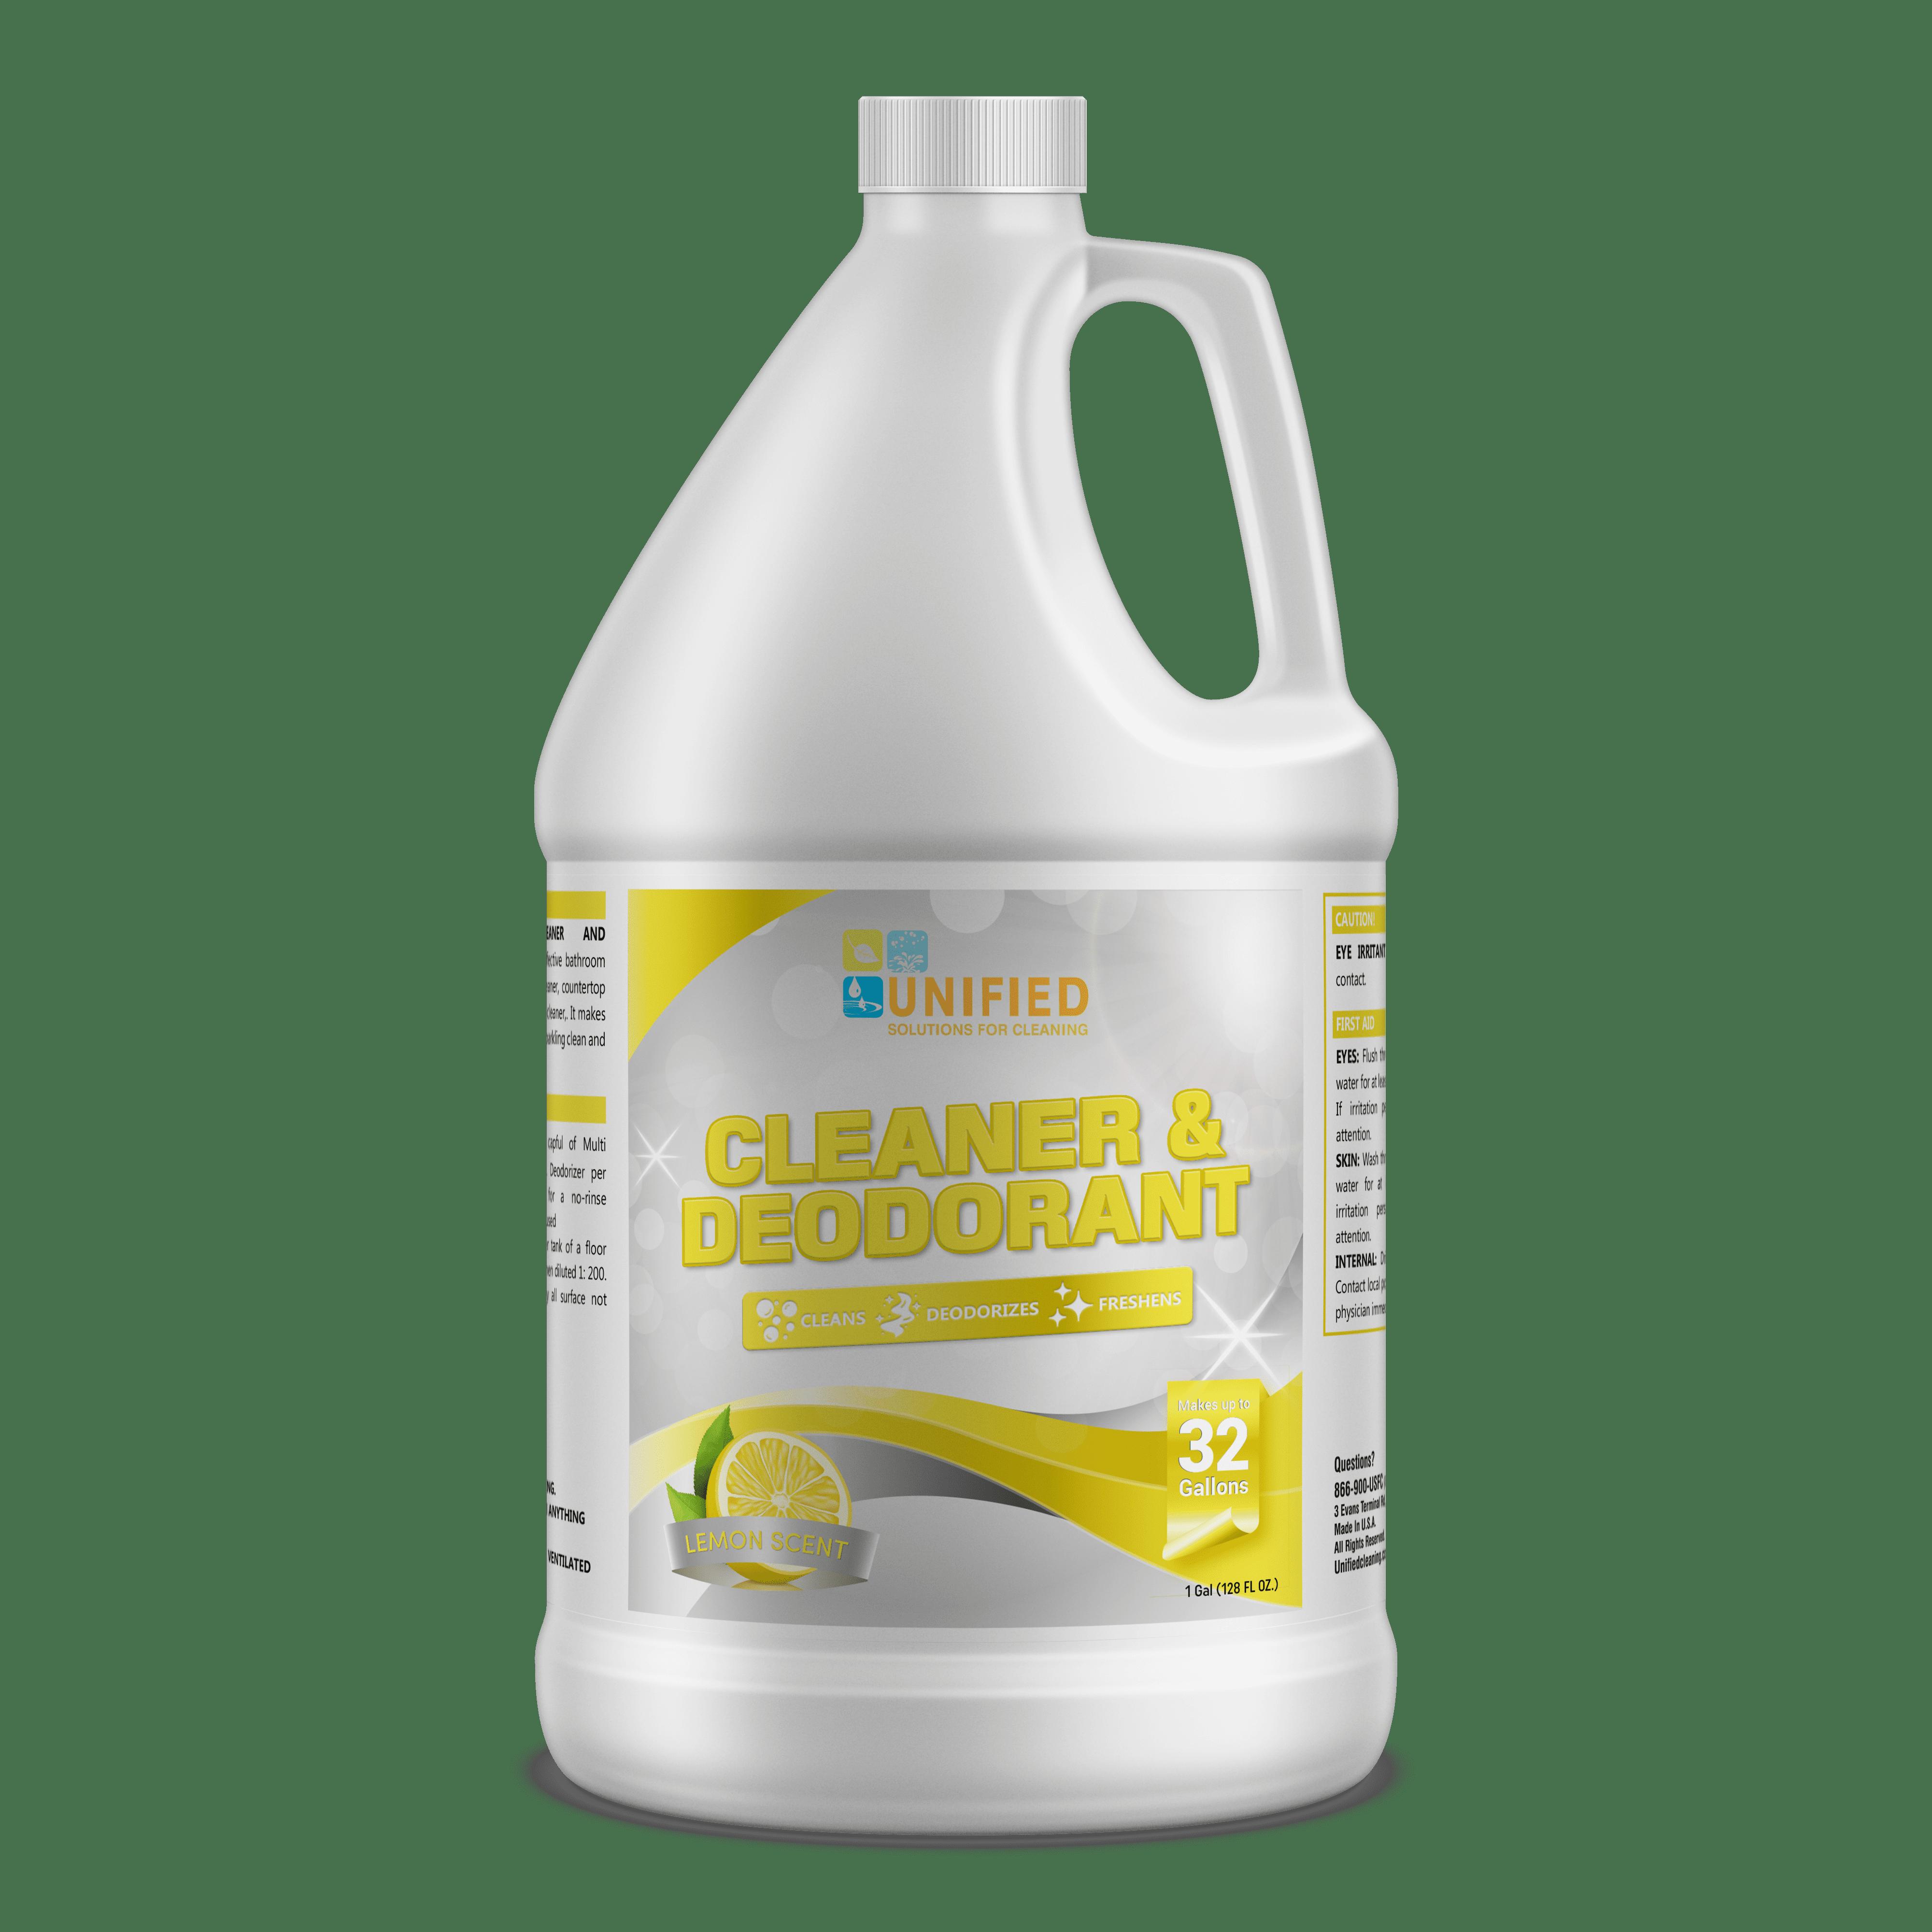 Lemon cleaner and deodorant